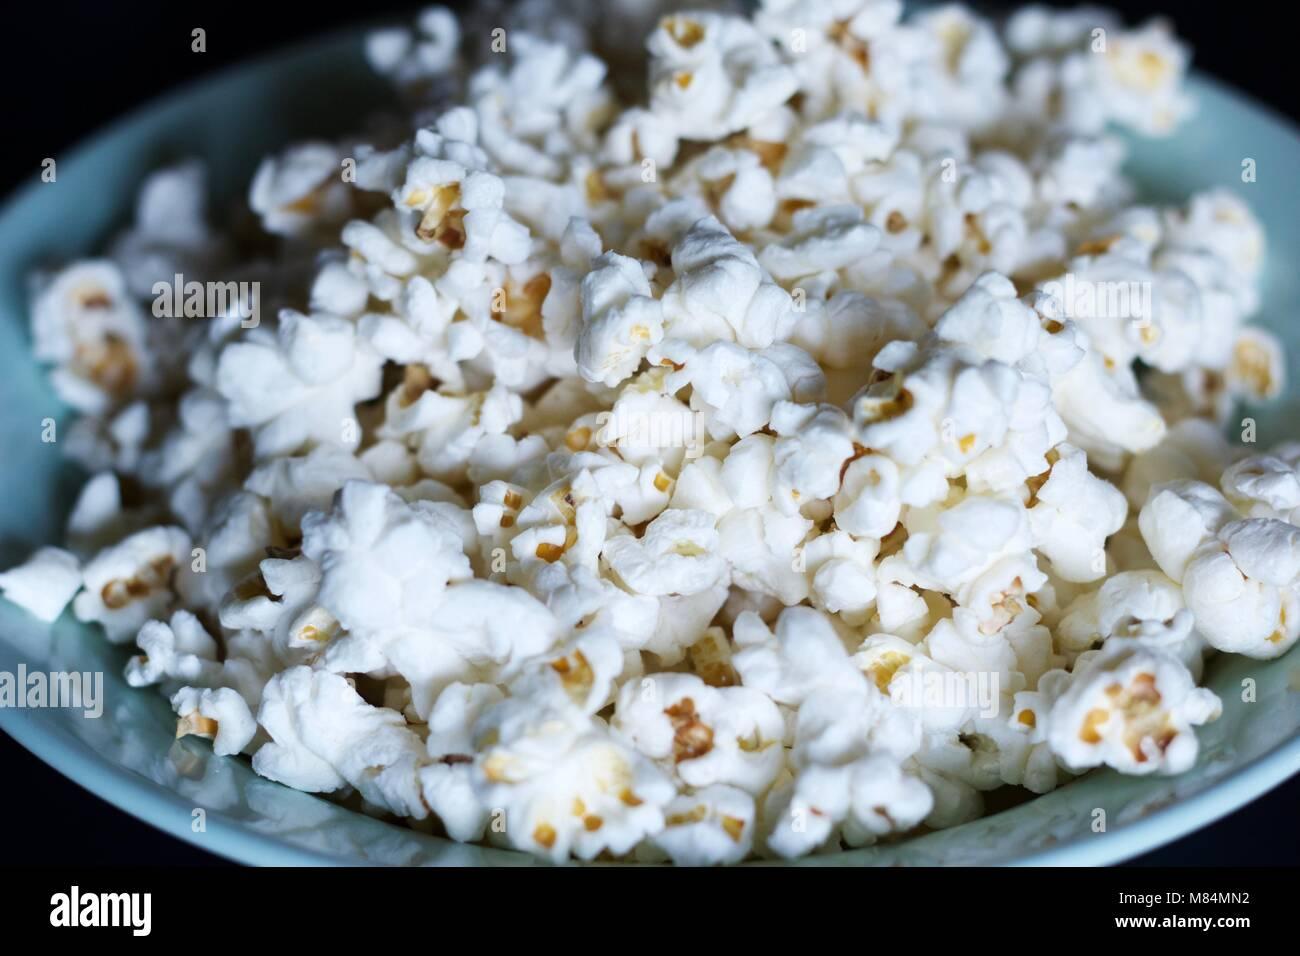 Popcorn - Stock Image